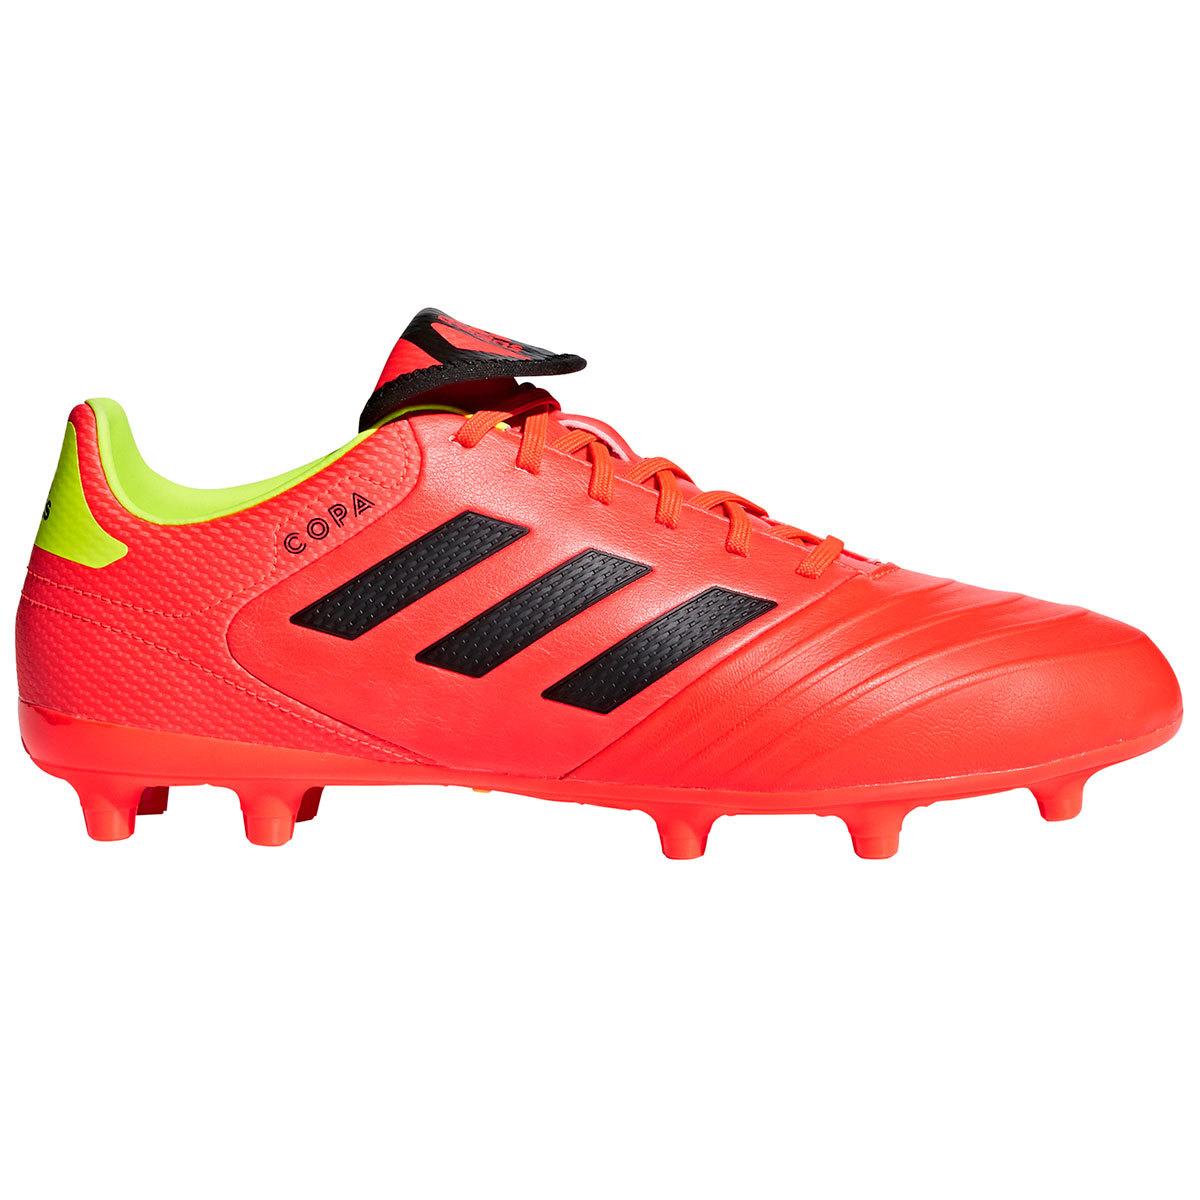 Adidas Men's Copa 18.3 Firm Ground Soccer Cleats - Orange, 8